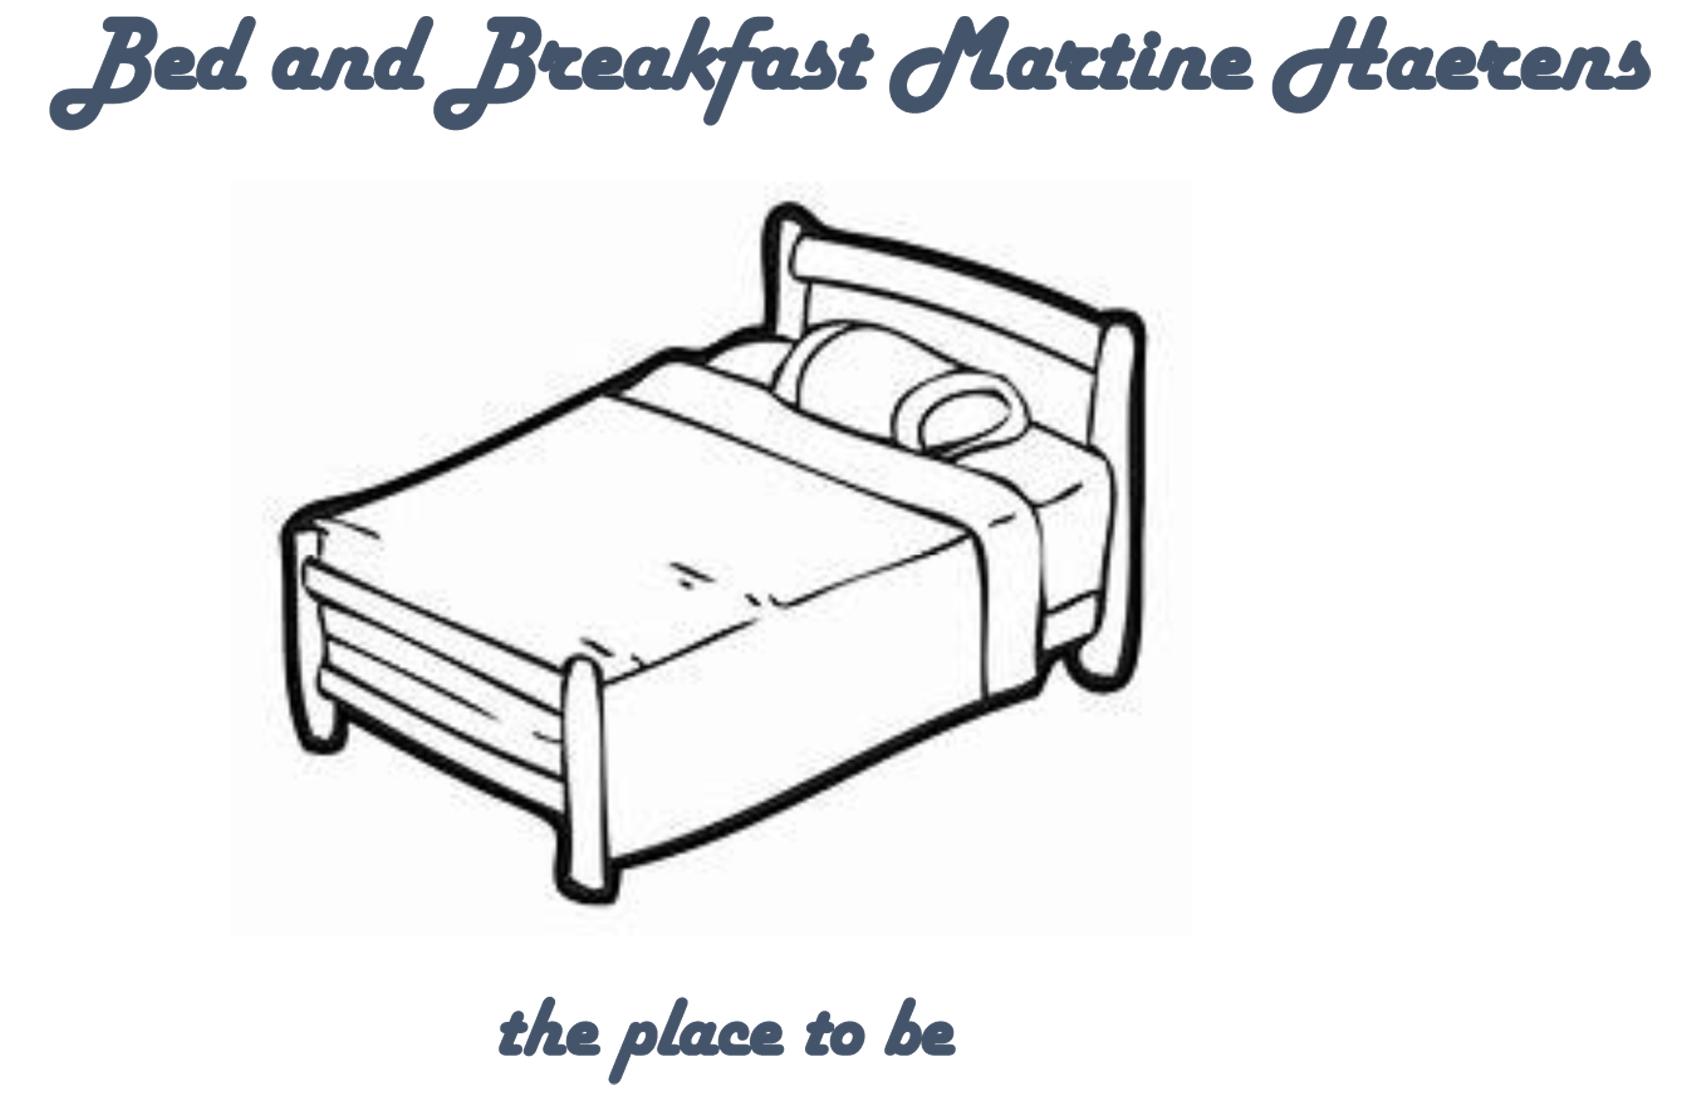 bed and breakfast Martine Haerens